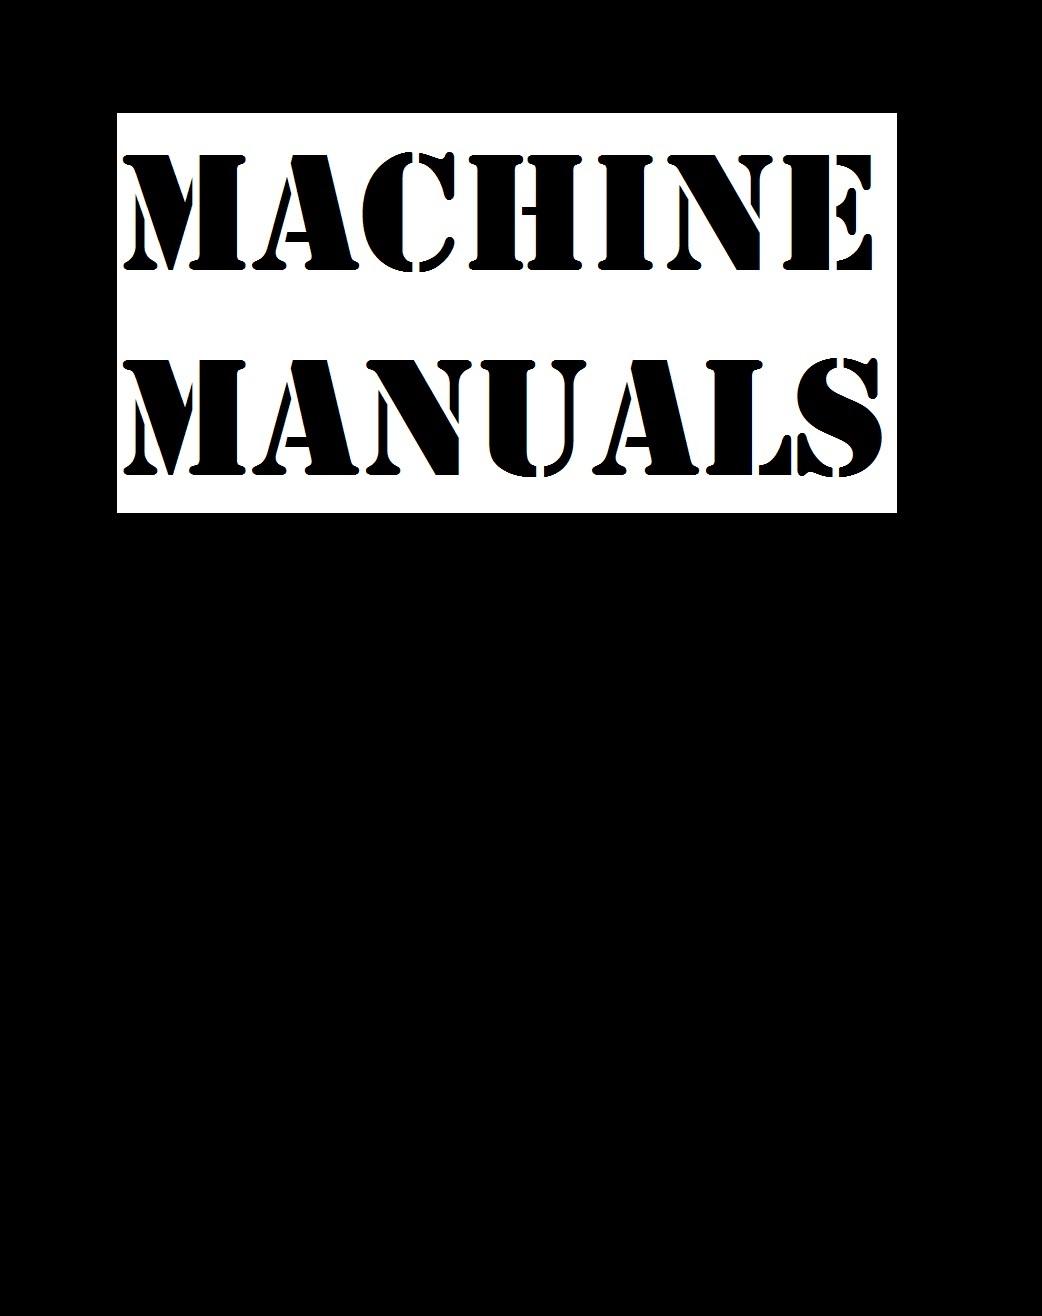 Machine Manuals